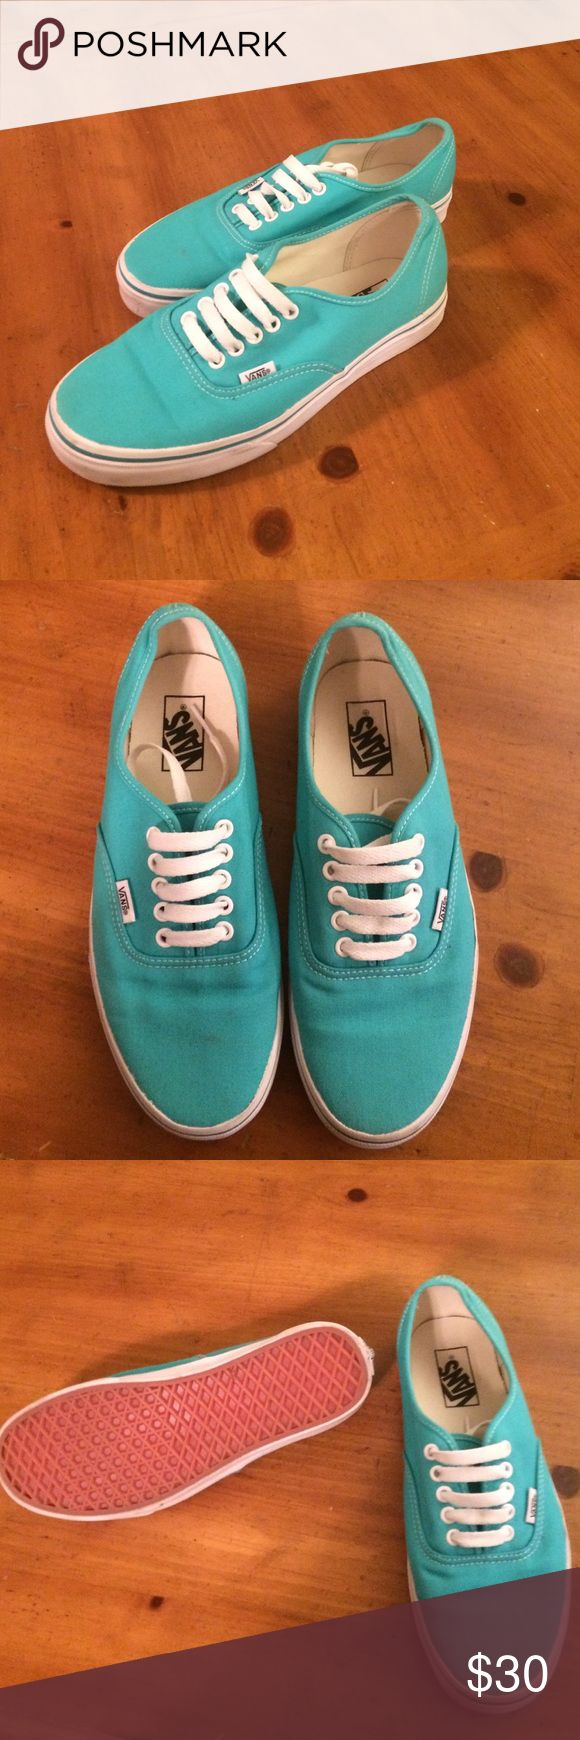 SUPER CUTE AUTHENTIC TEAL VANS SUPER CUTE AND STYLISH AUTHENTIC TEAL VANS WORN TWICE! MENS 8 WOMENS 9.5 Vans Shoes Sneakers